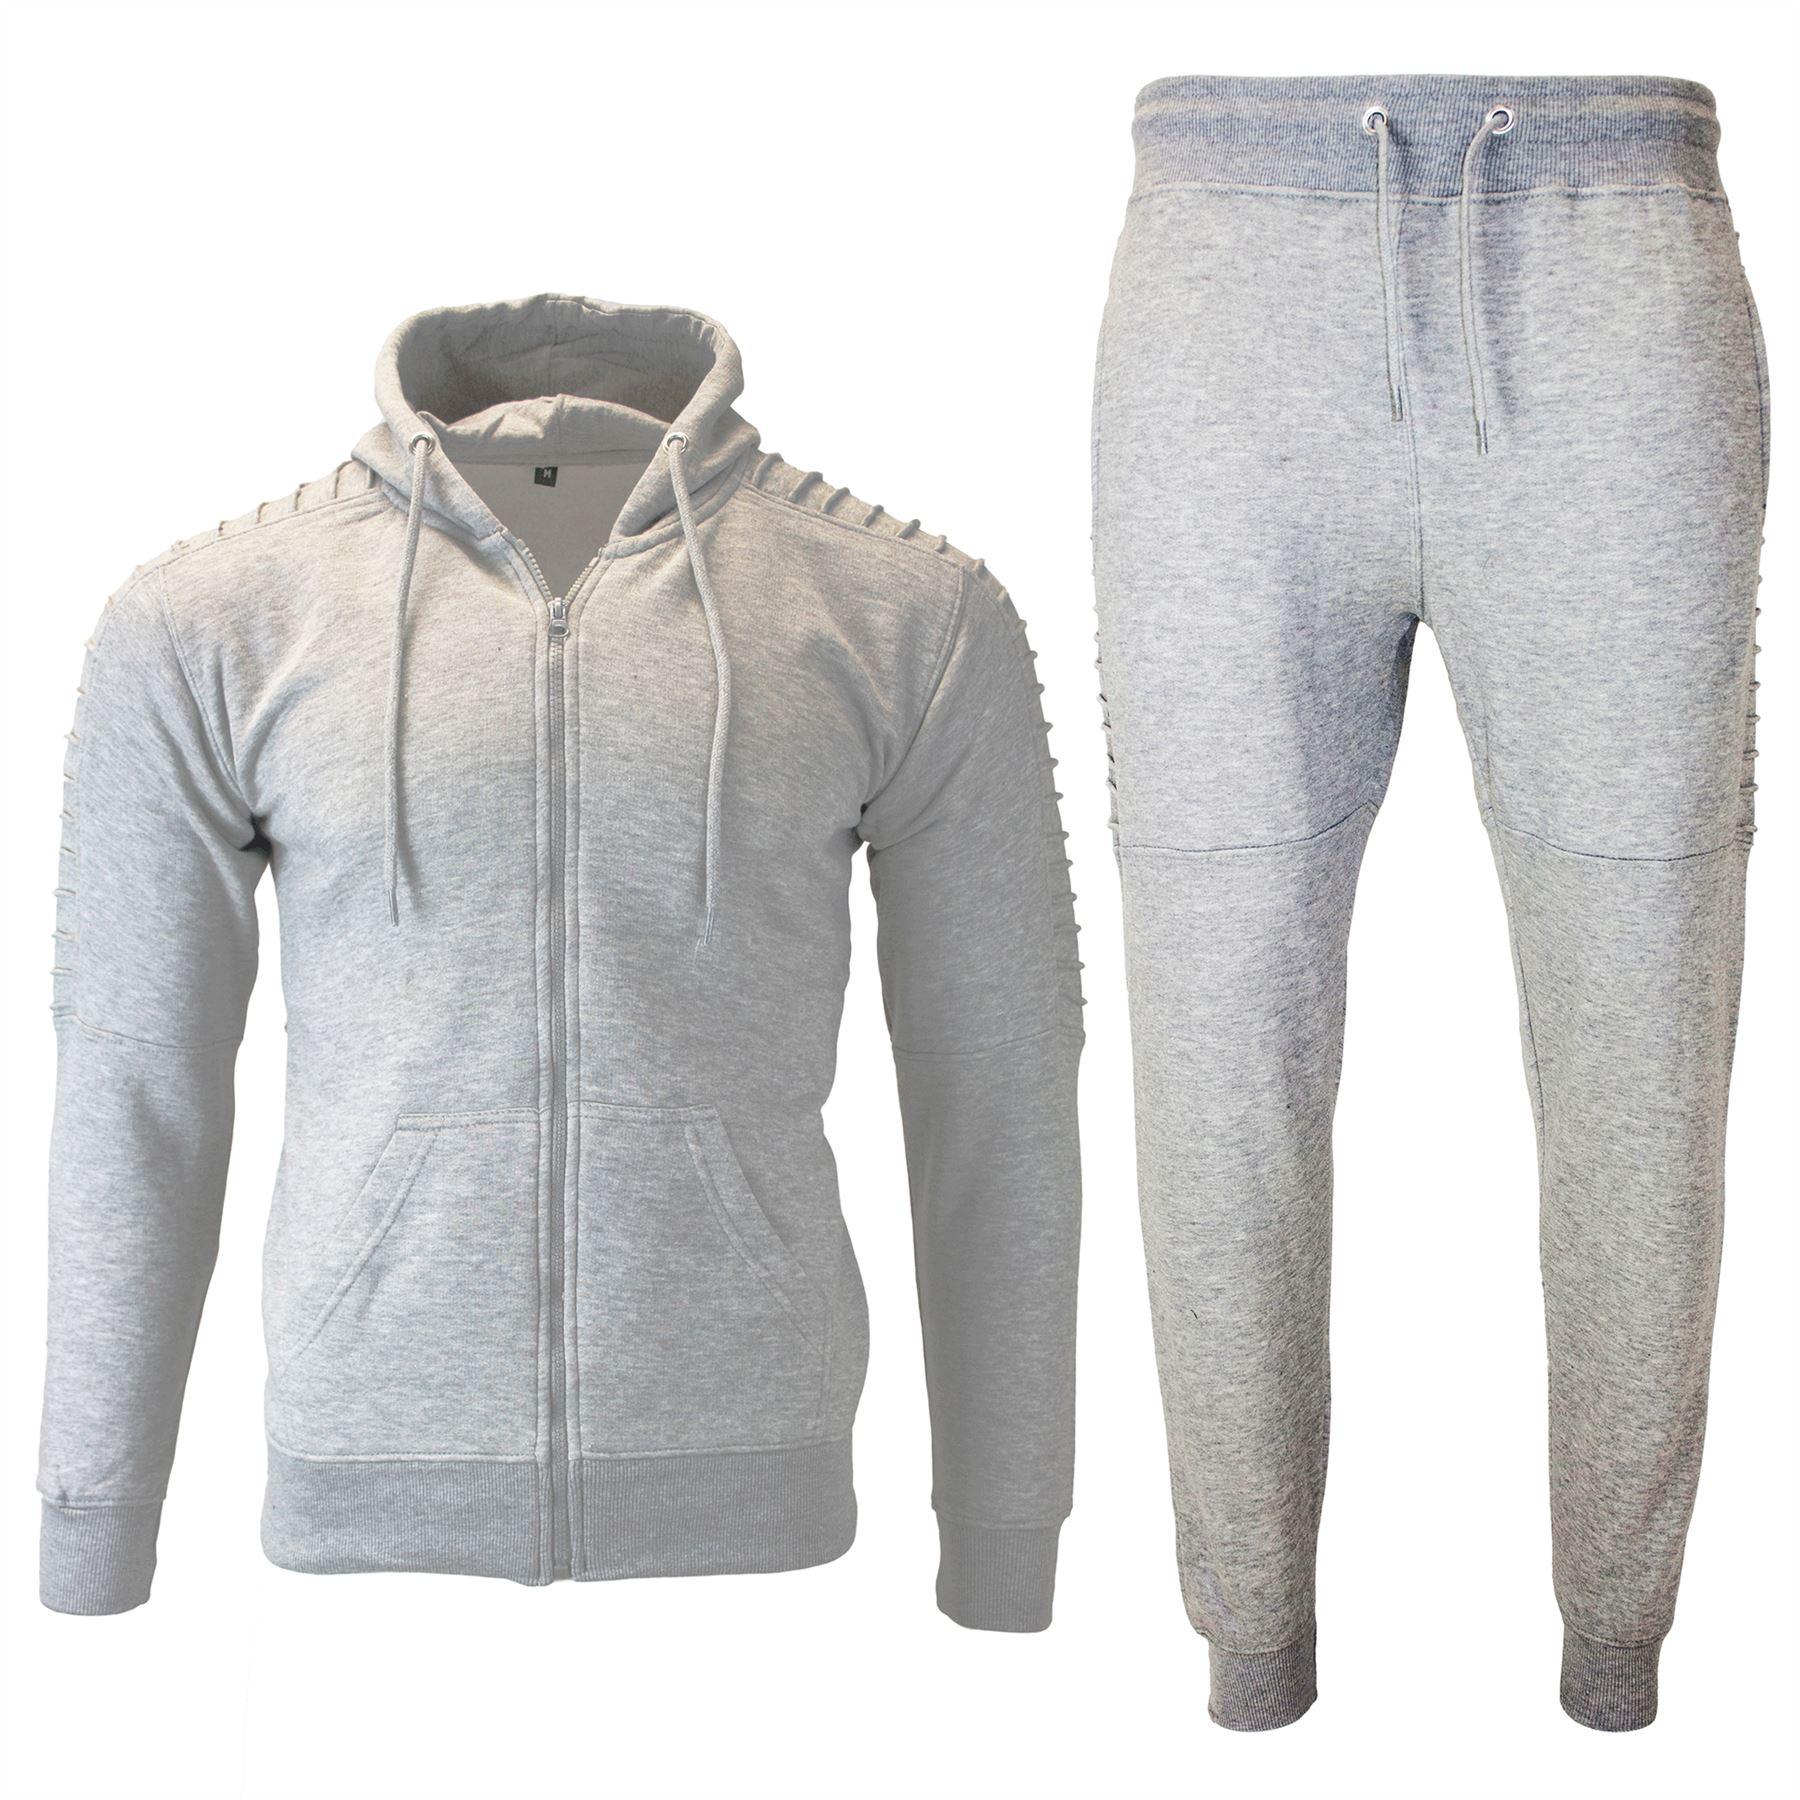 Mens-Fleece-Jogging-Zip-Up-Ribbed-Skinny-Trouser-